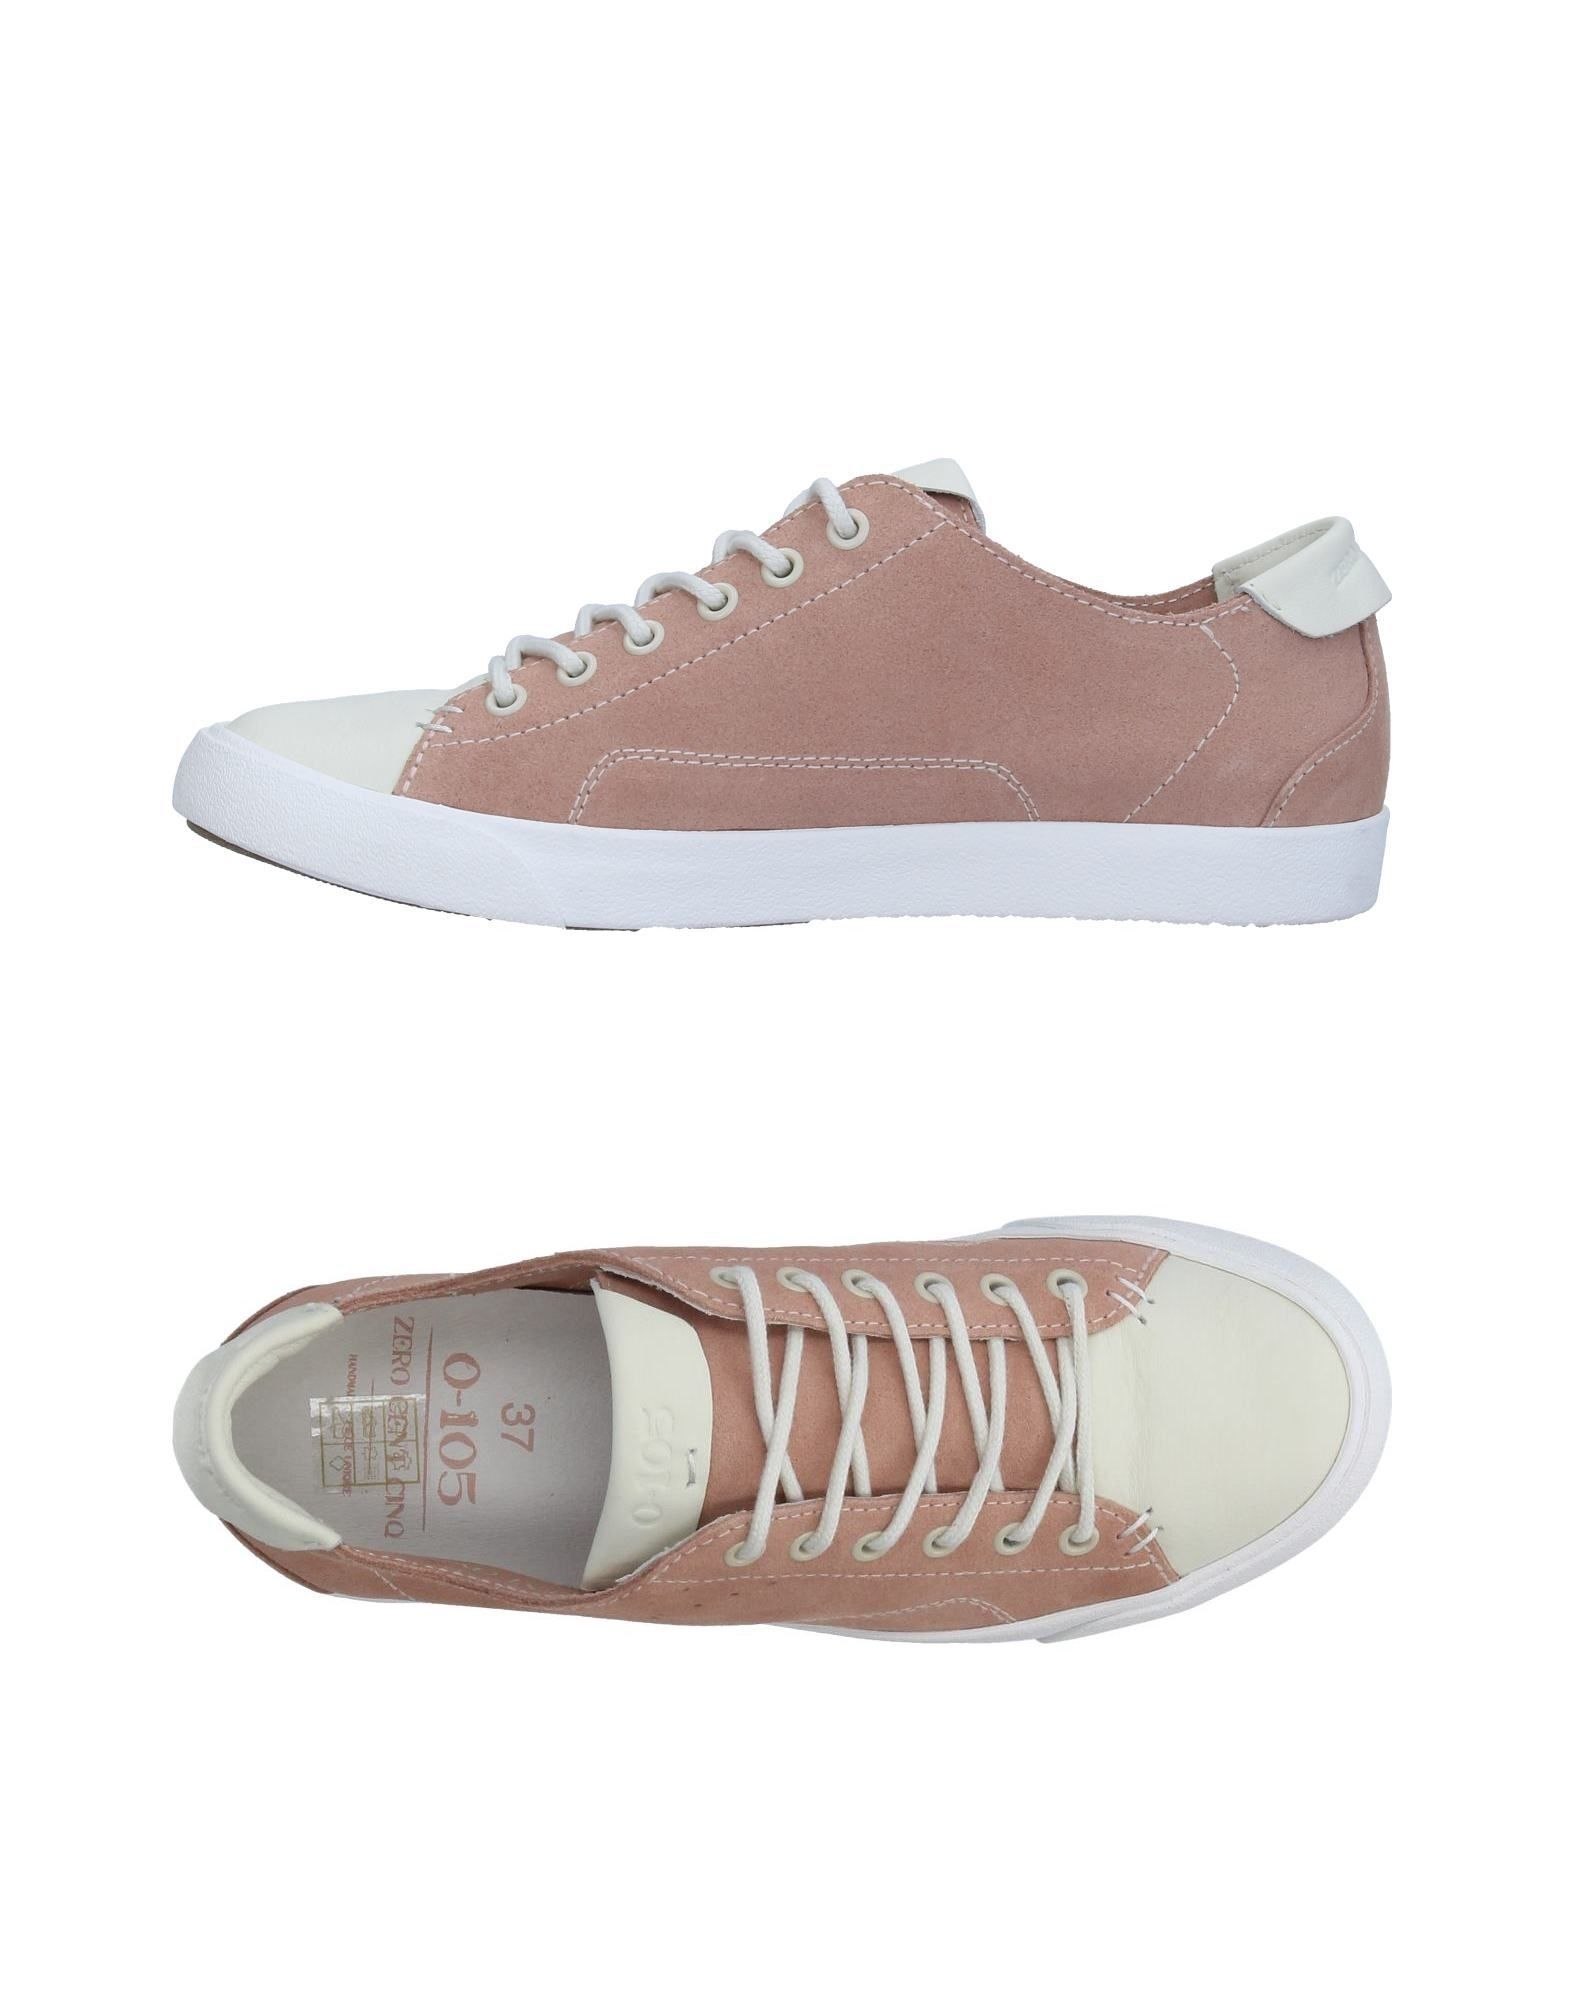 0-105 ZERO CENT CINQ Низкие кеды и кроссовки кеды кроссовки высокие dc evan hi zero light pink